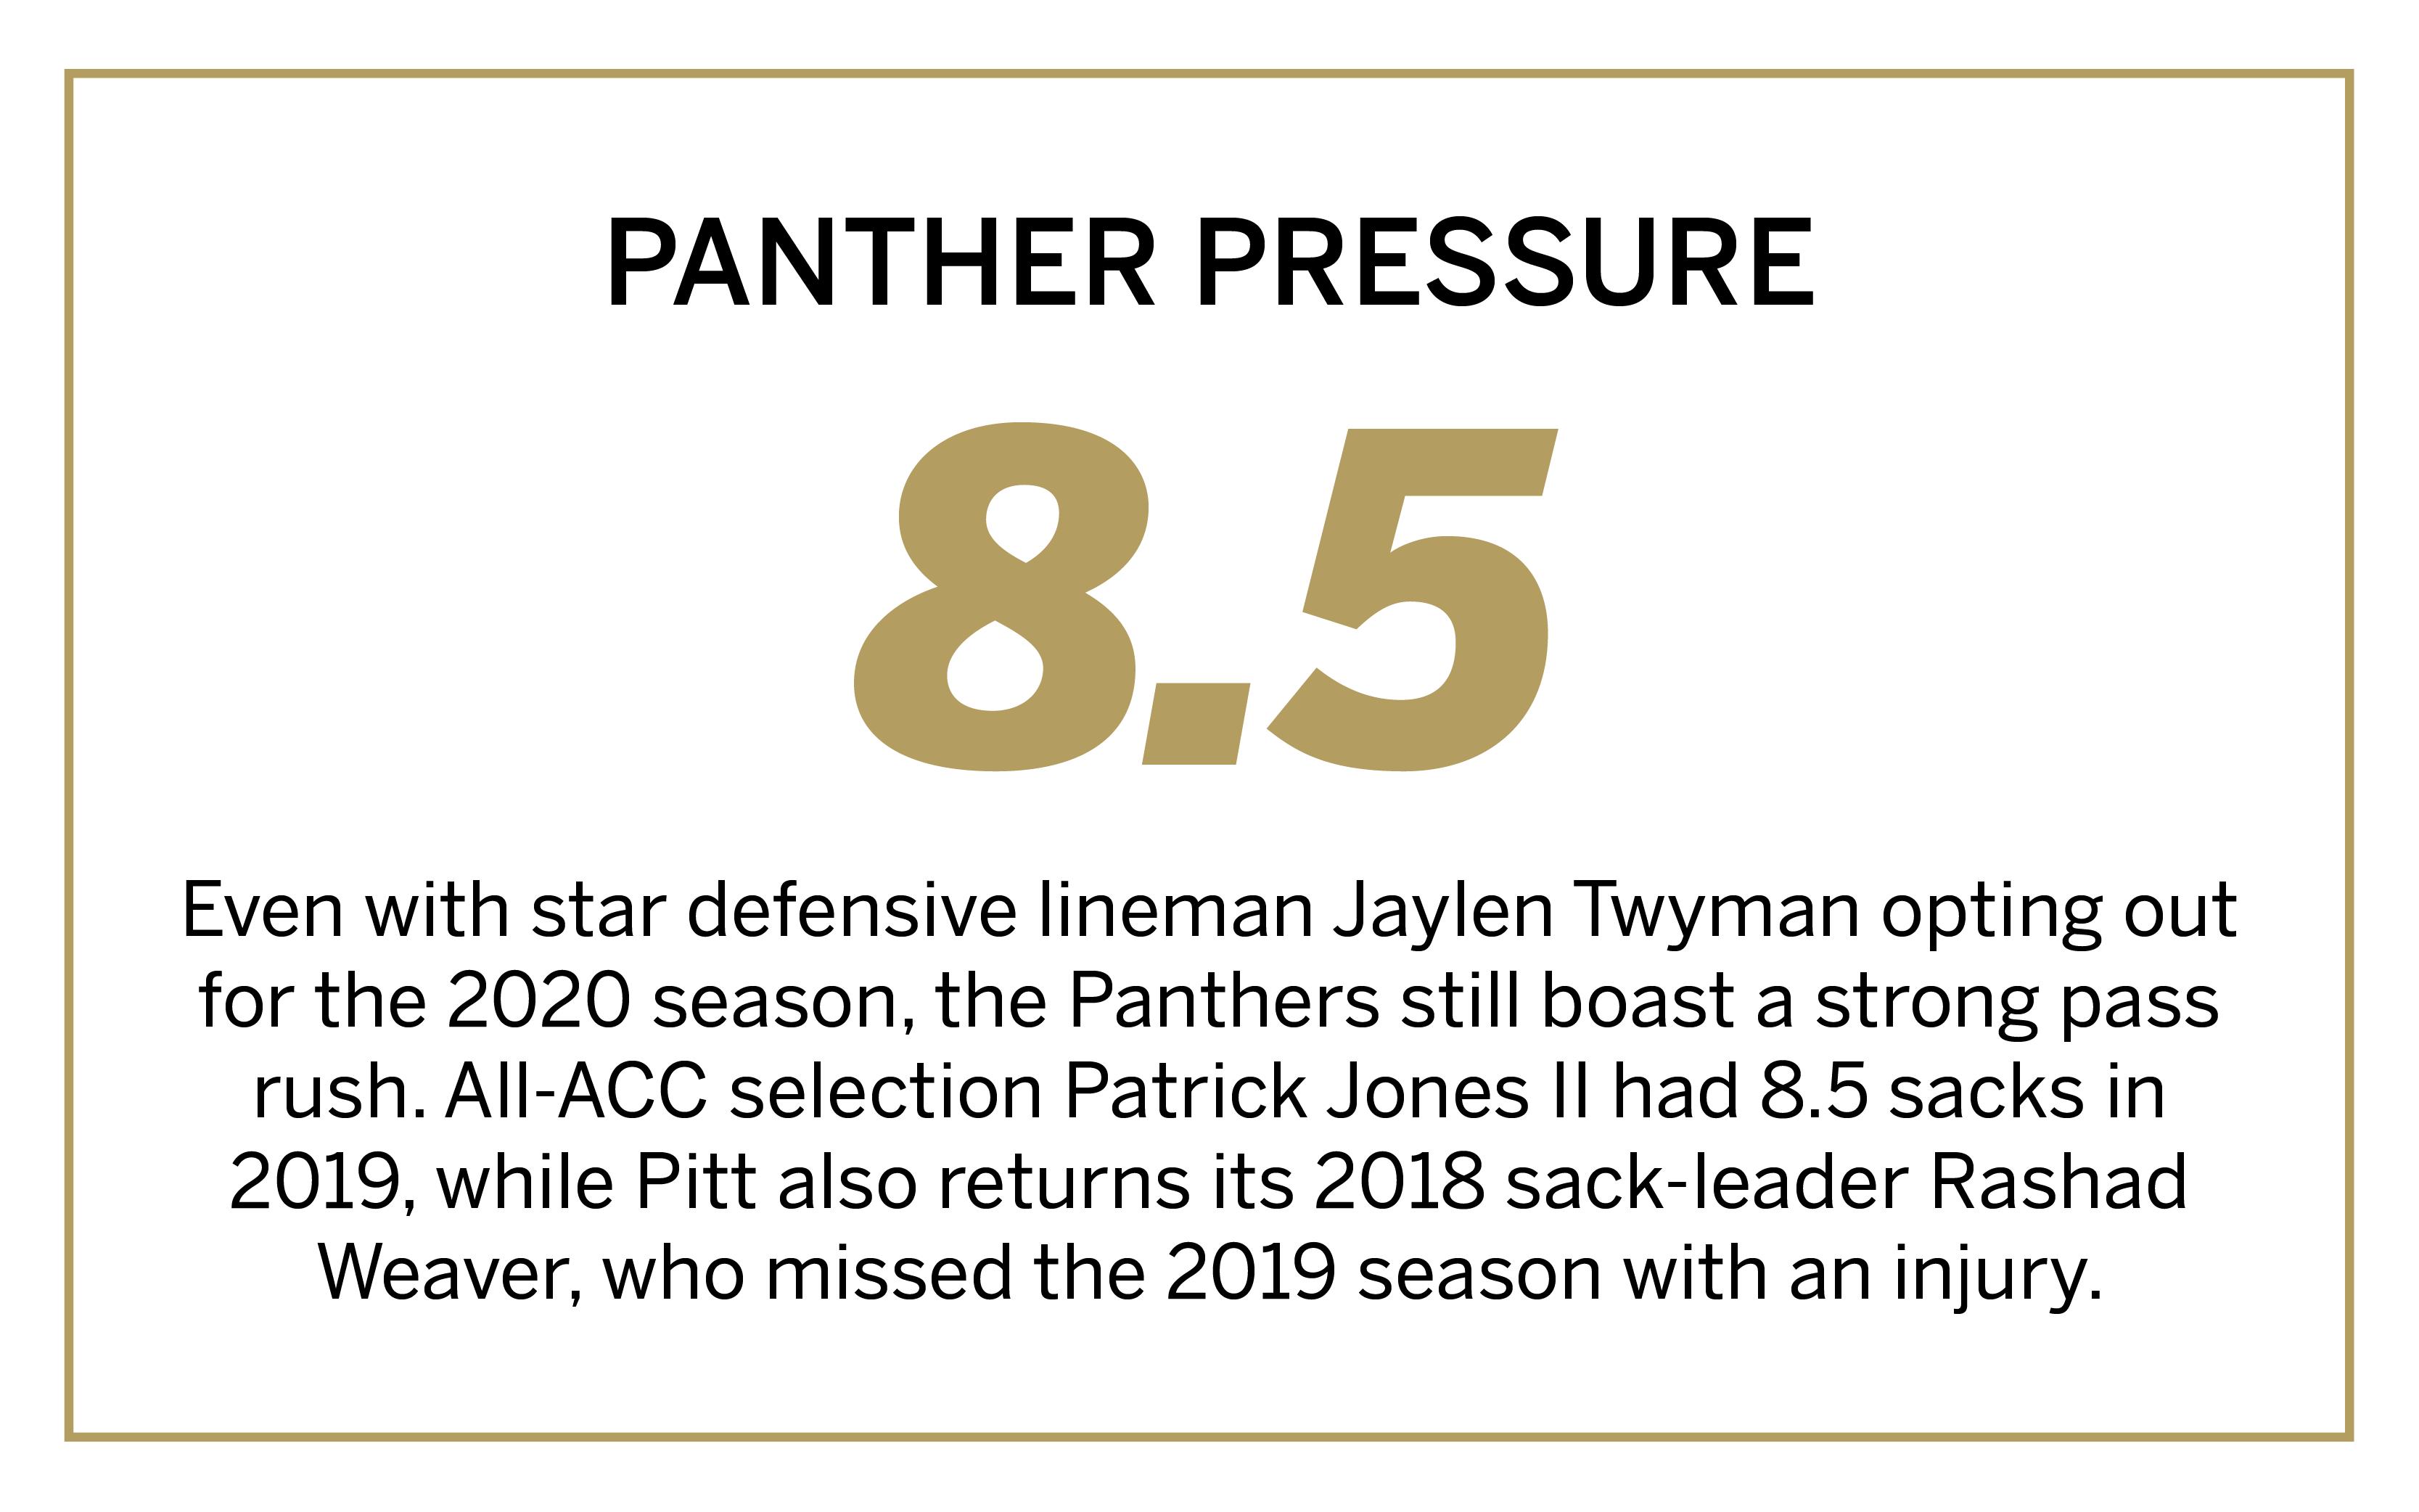 Panther sacks